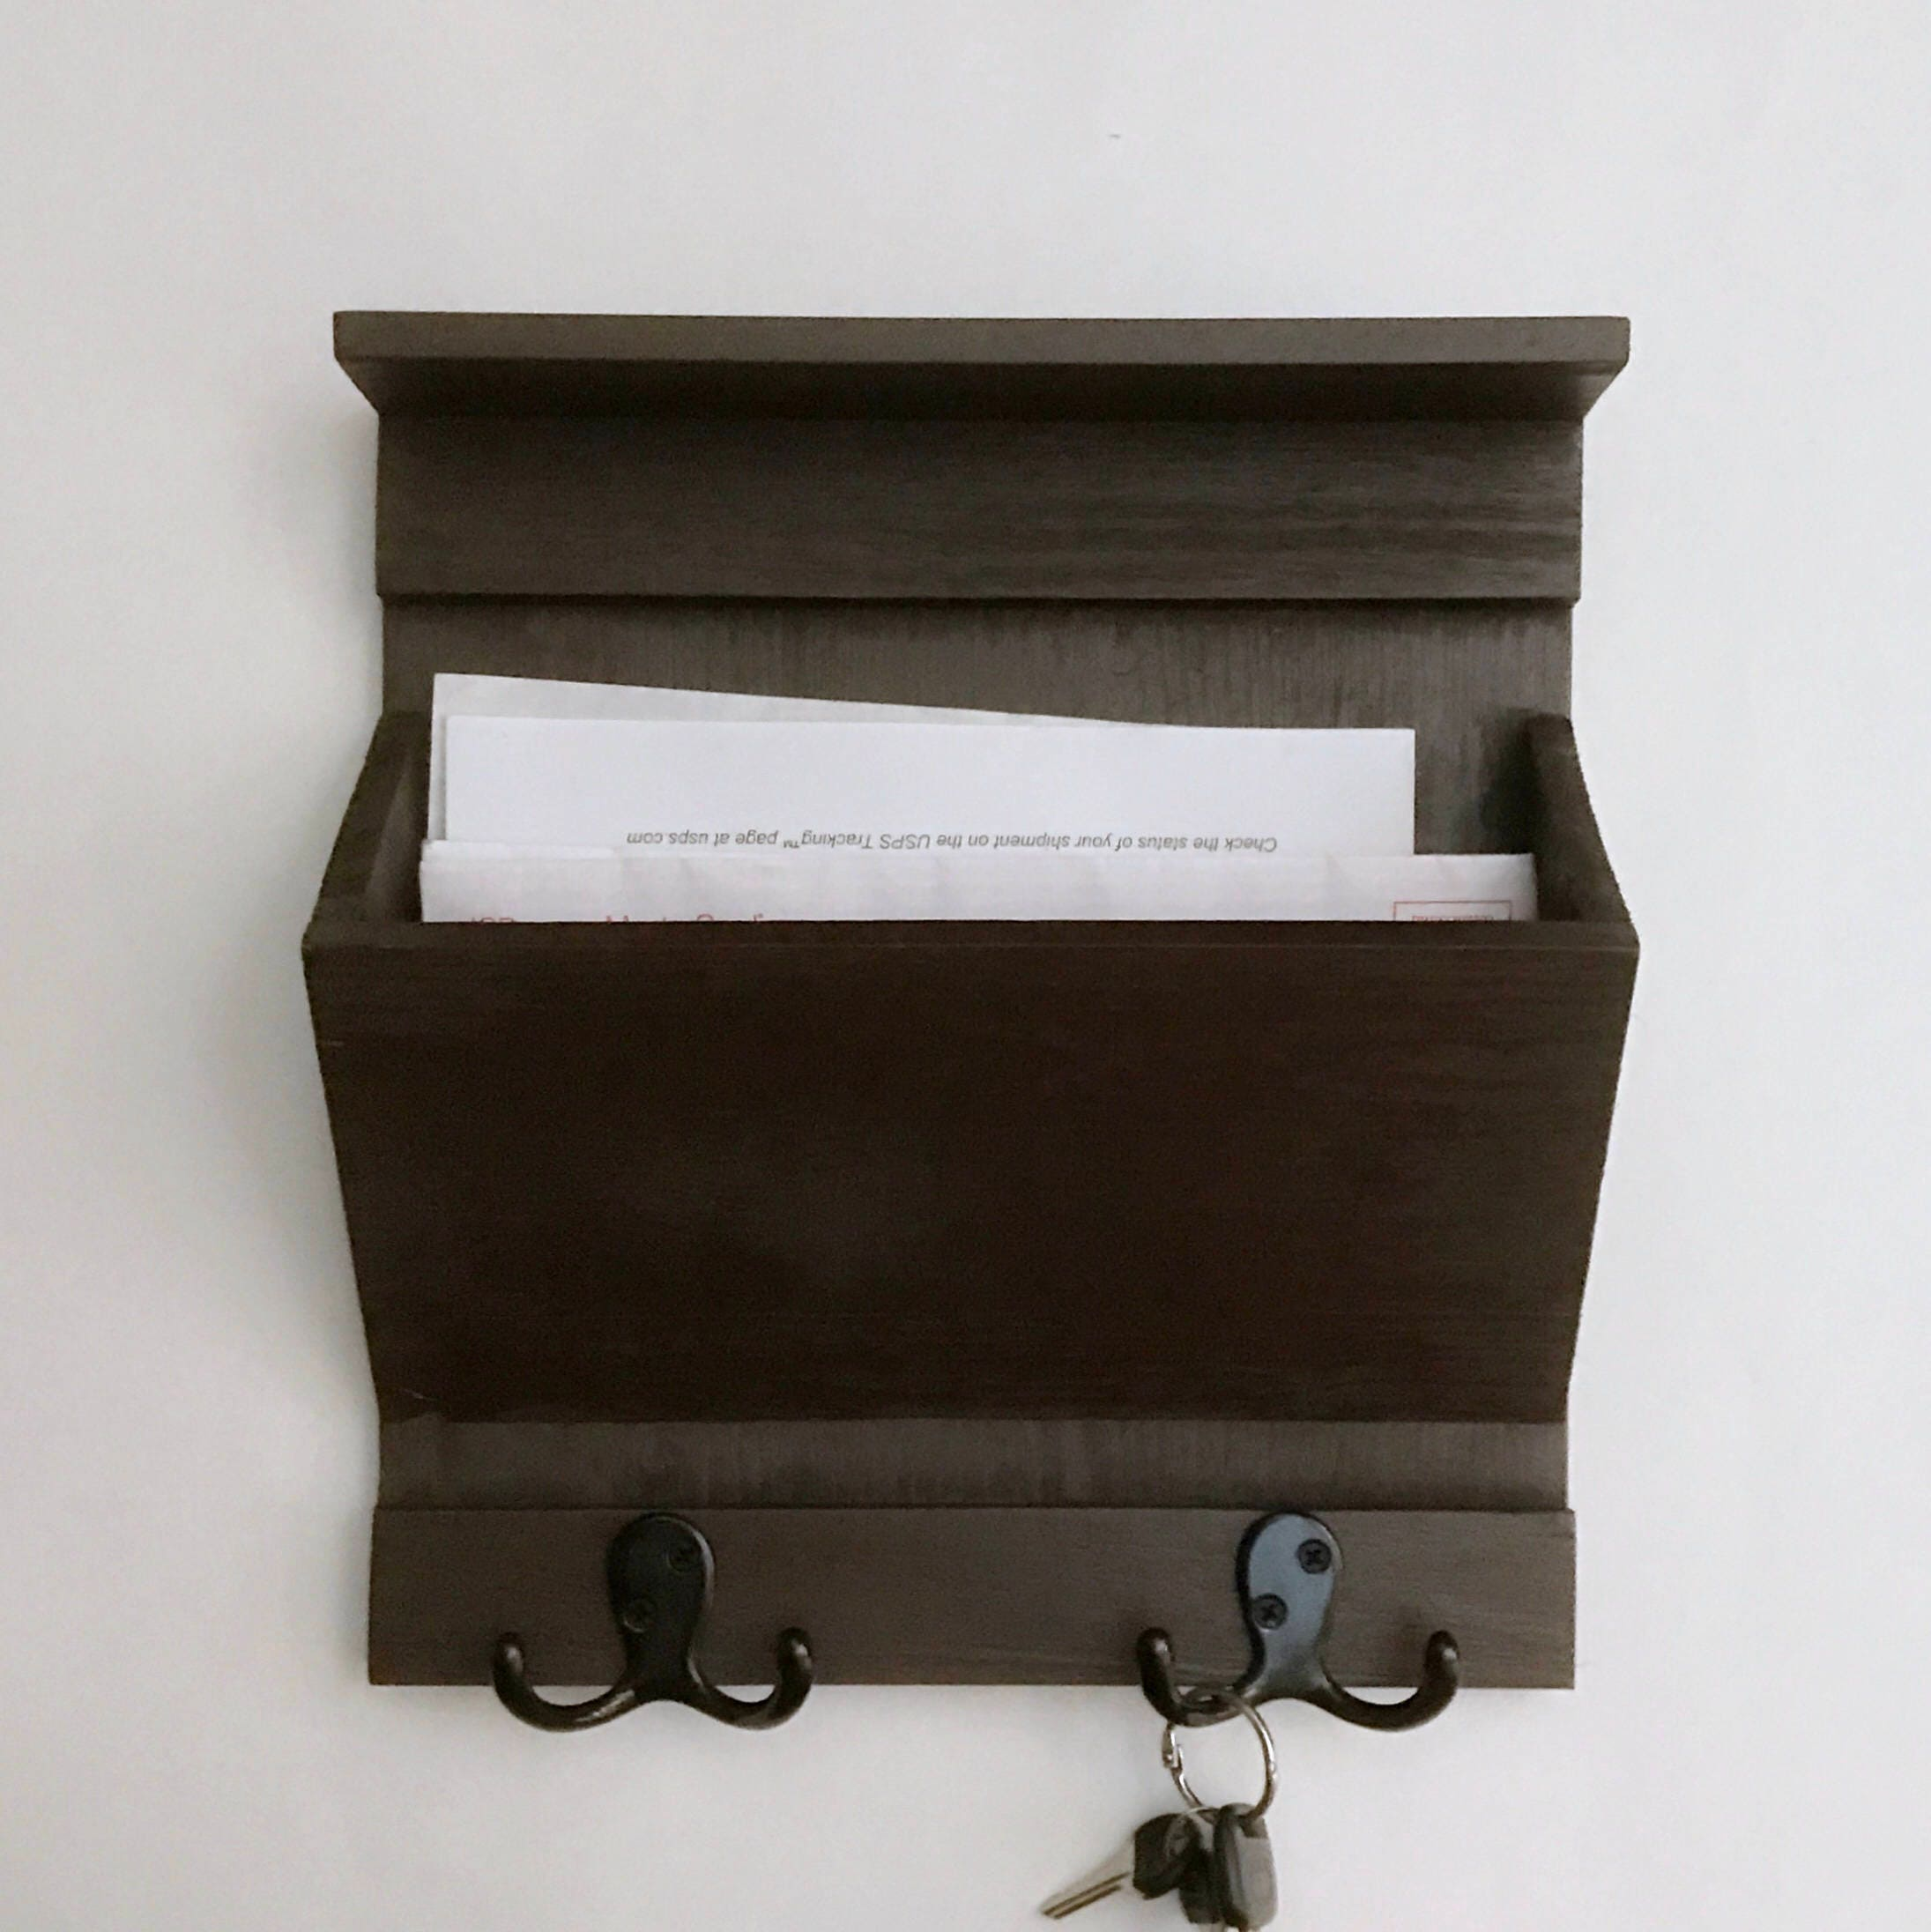 Entryway Organizer Lightweight Rustic Mail Key holder made